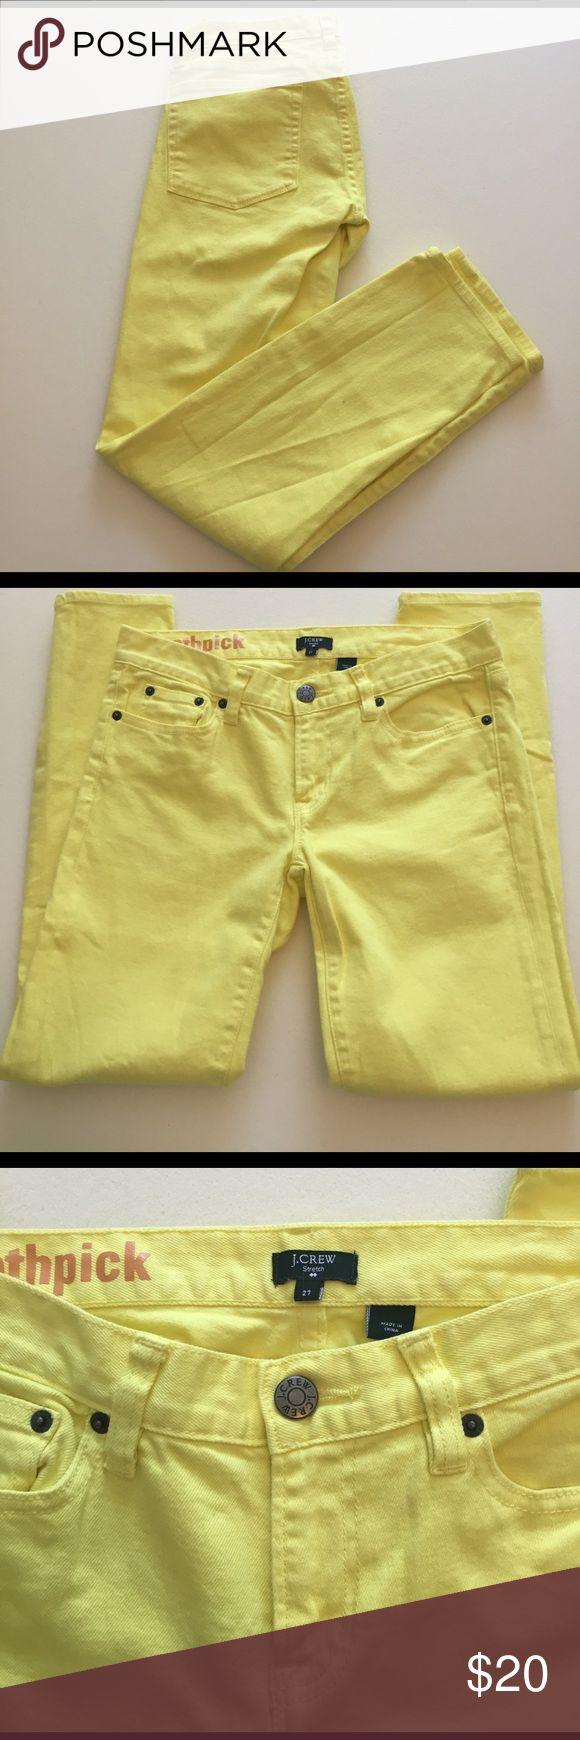 J.Crew Factory Yellow Skinny Jeans EUC, Toothpick cut, Size 27 J.Crew Factory Jeans Skinny